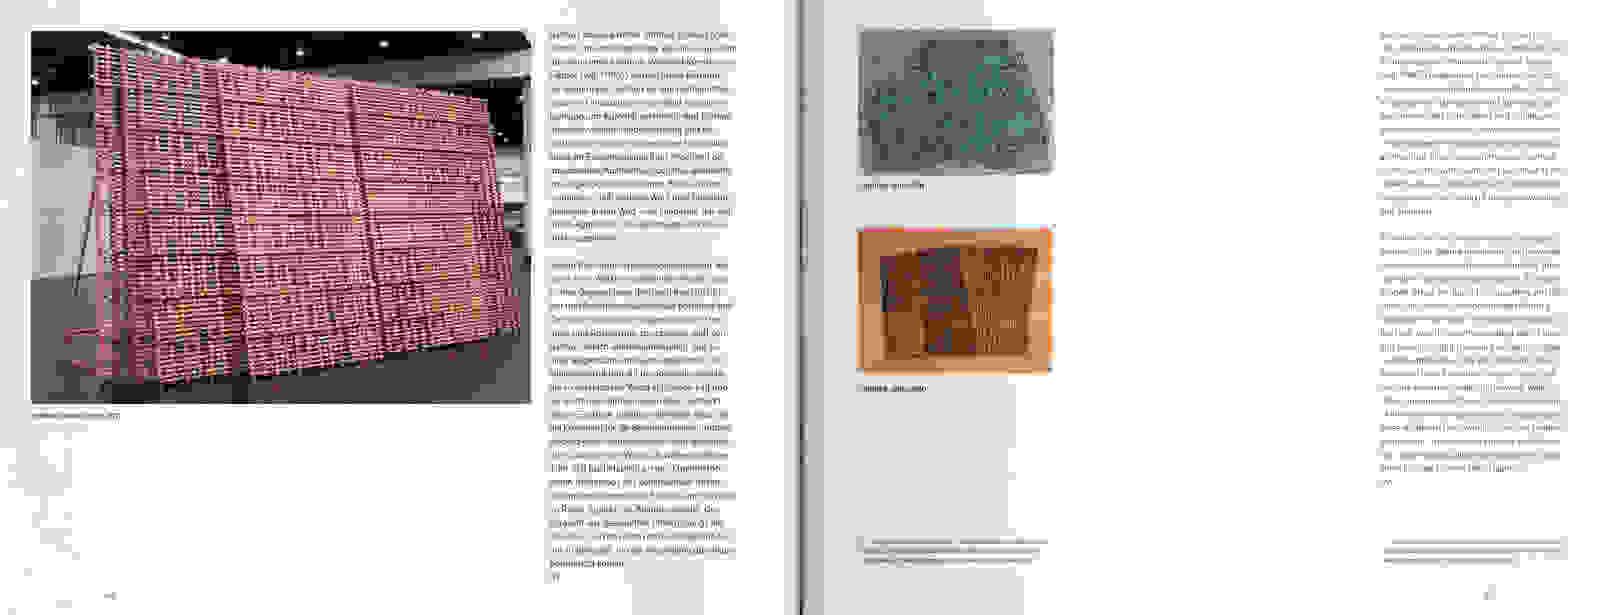 Phyllida Barlow DS 1600x615 10